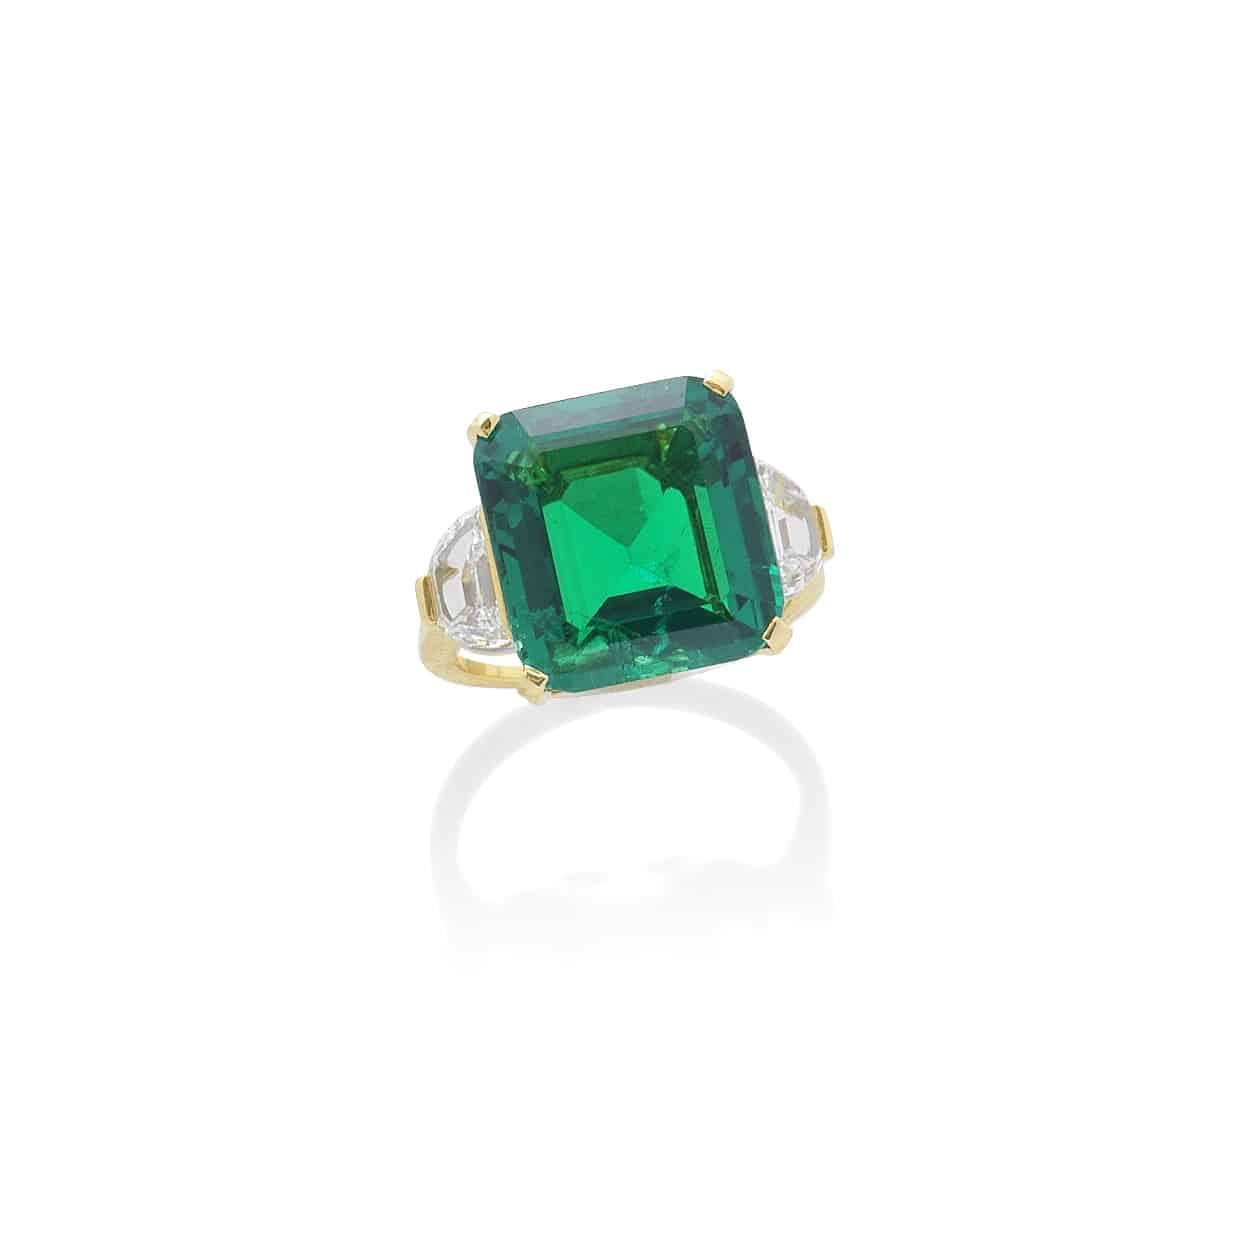 Top lot Bulgari emerald ring outperforms at Bonhams London Jewels sale